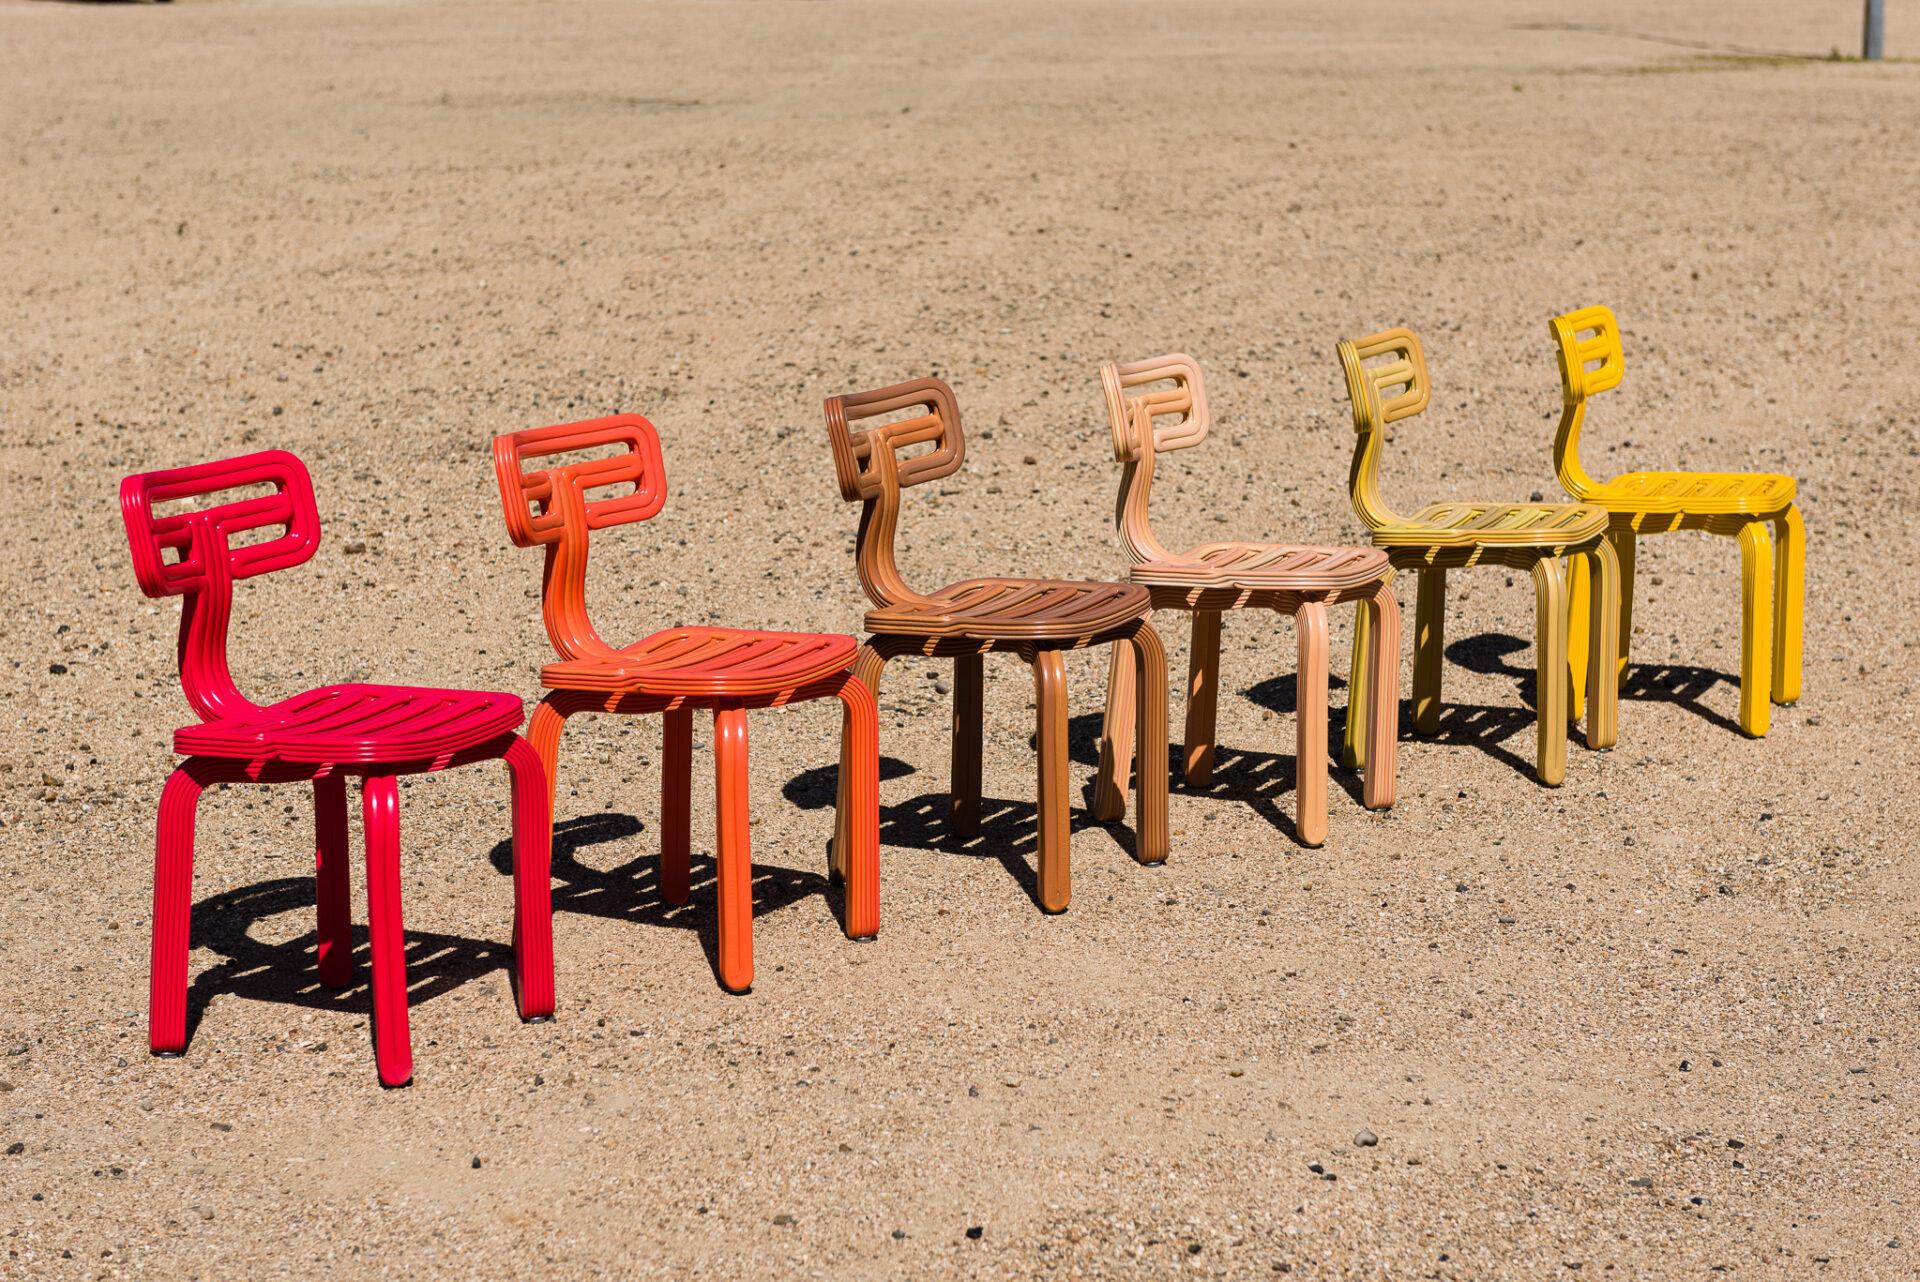 Kooij Chubby Chairs designed by Dirk van der Kooij